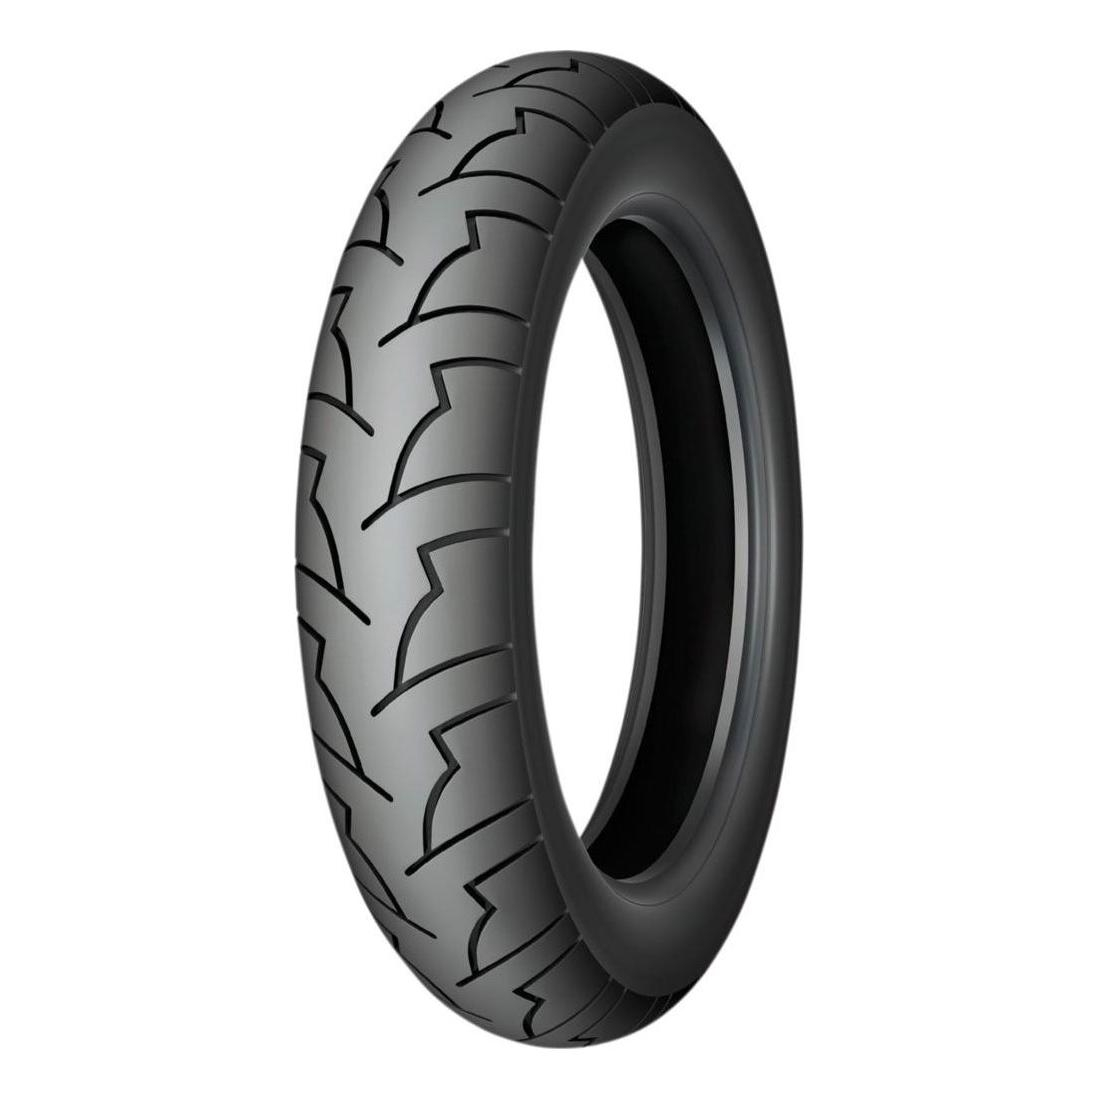 Pneu moto arrière Michelin Pilot Activ 130/70-18 63H TL/TT